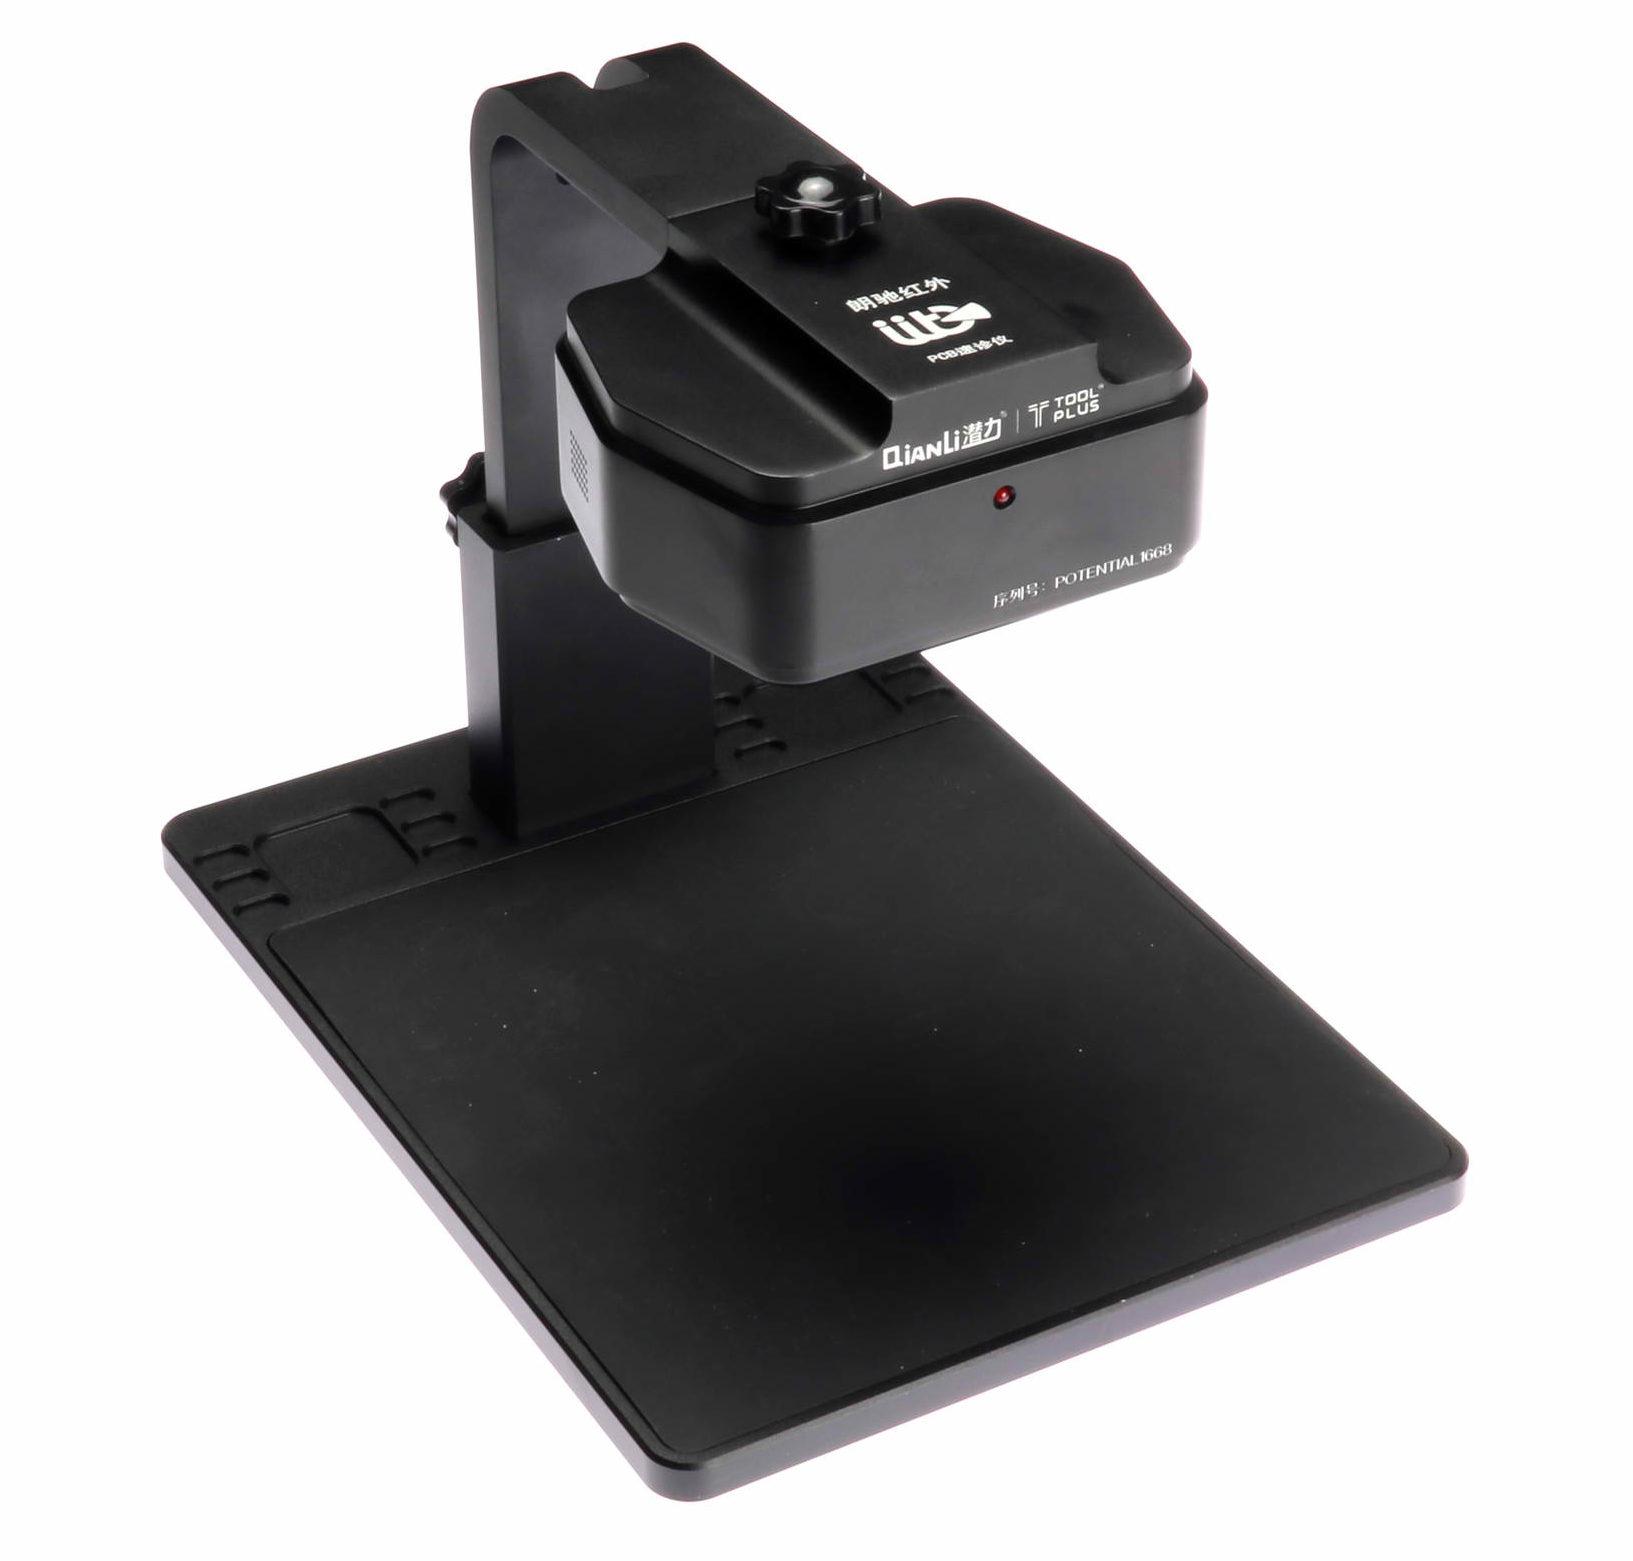 QianLi LC-IRP01 Thermal/Visible Microscope For PCB Repair